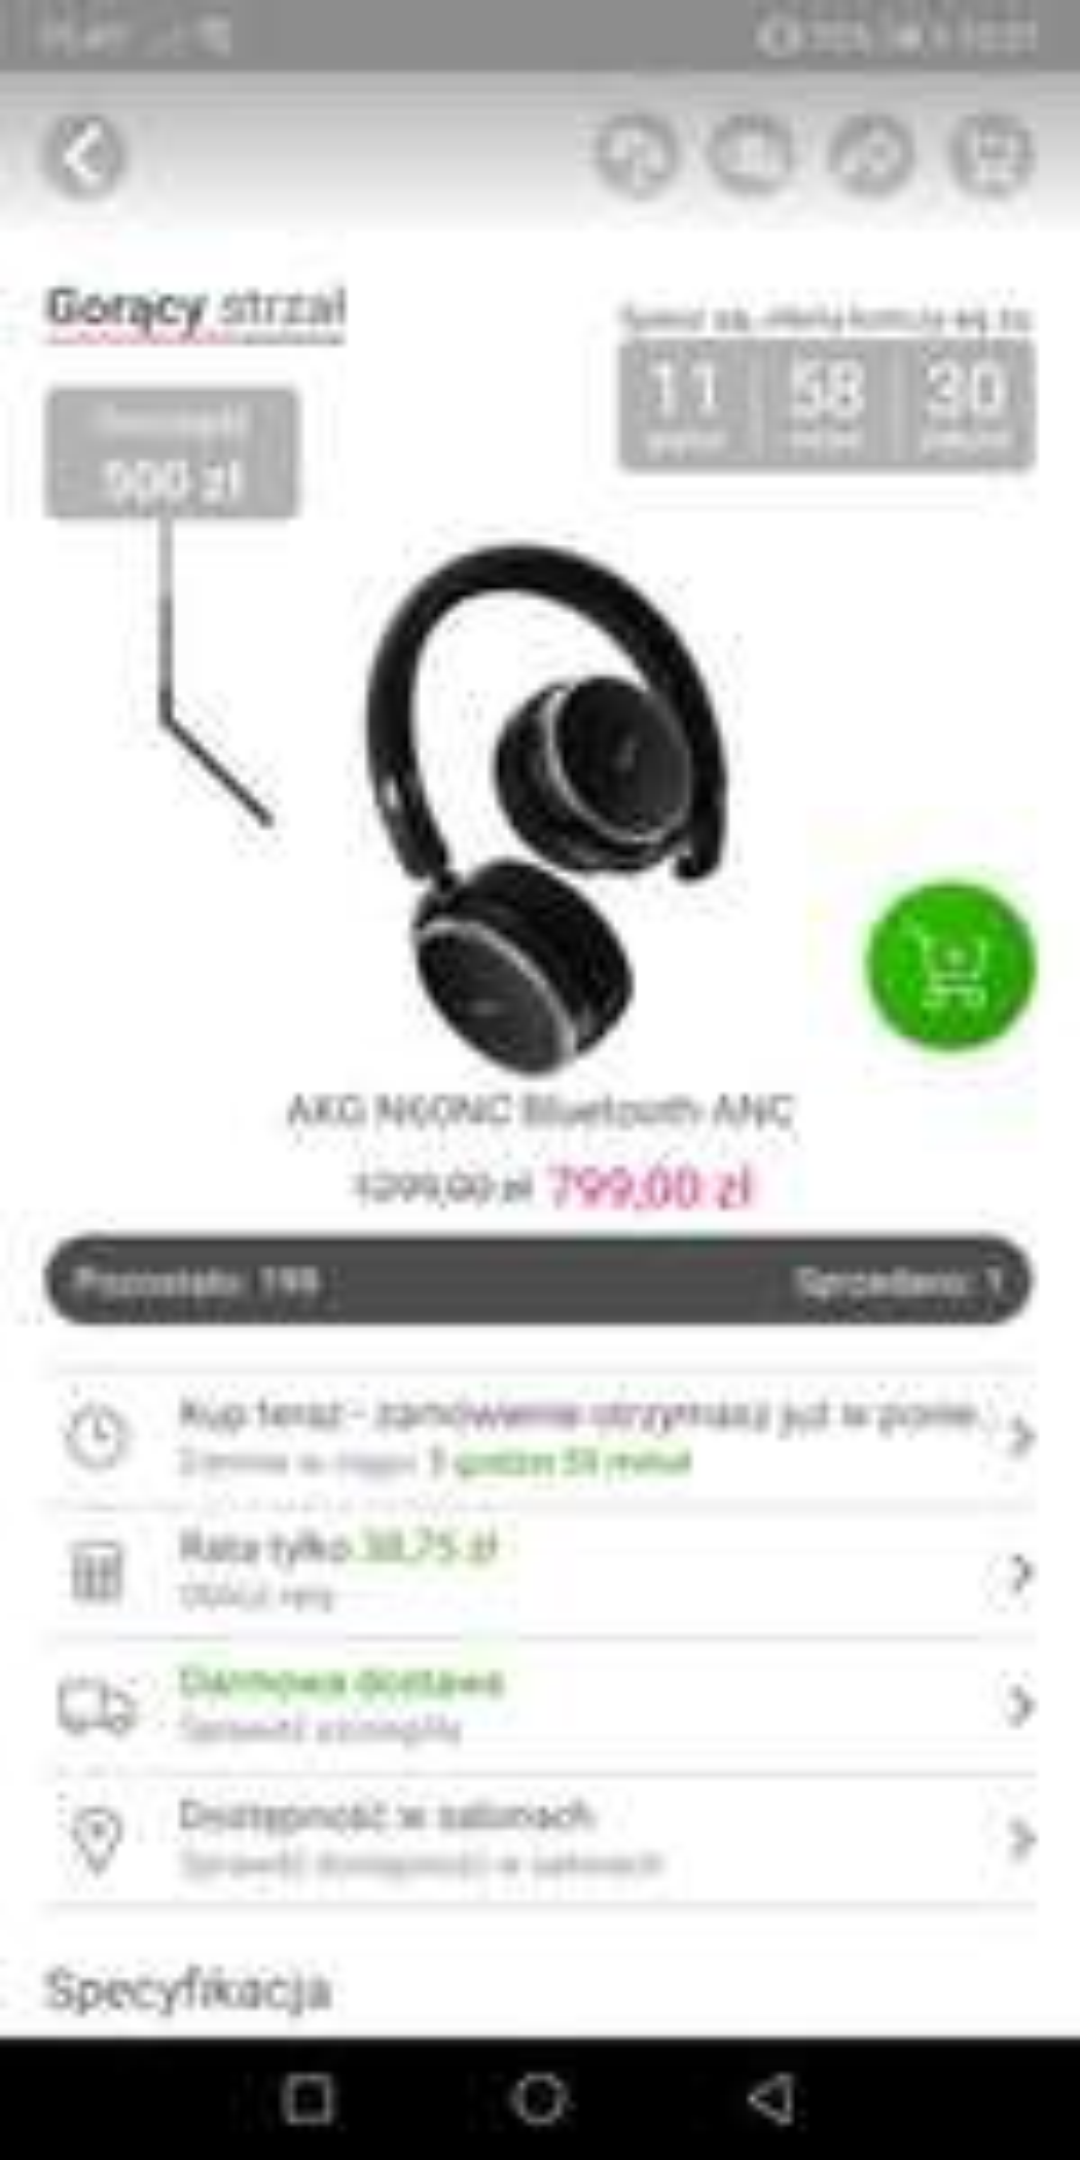 Słuchawki AKG N60NC Bluetooth ANC